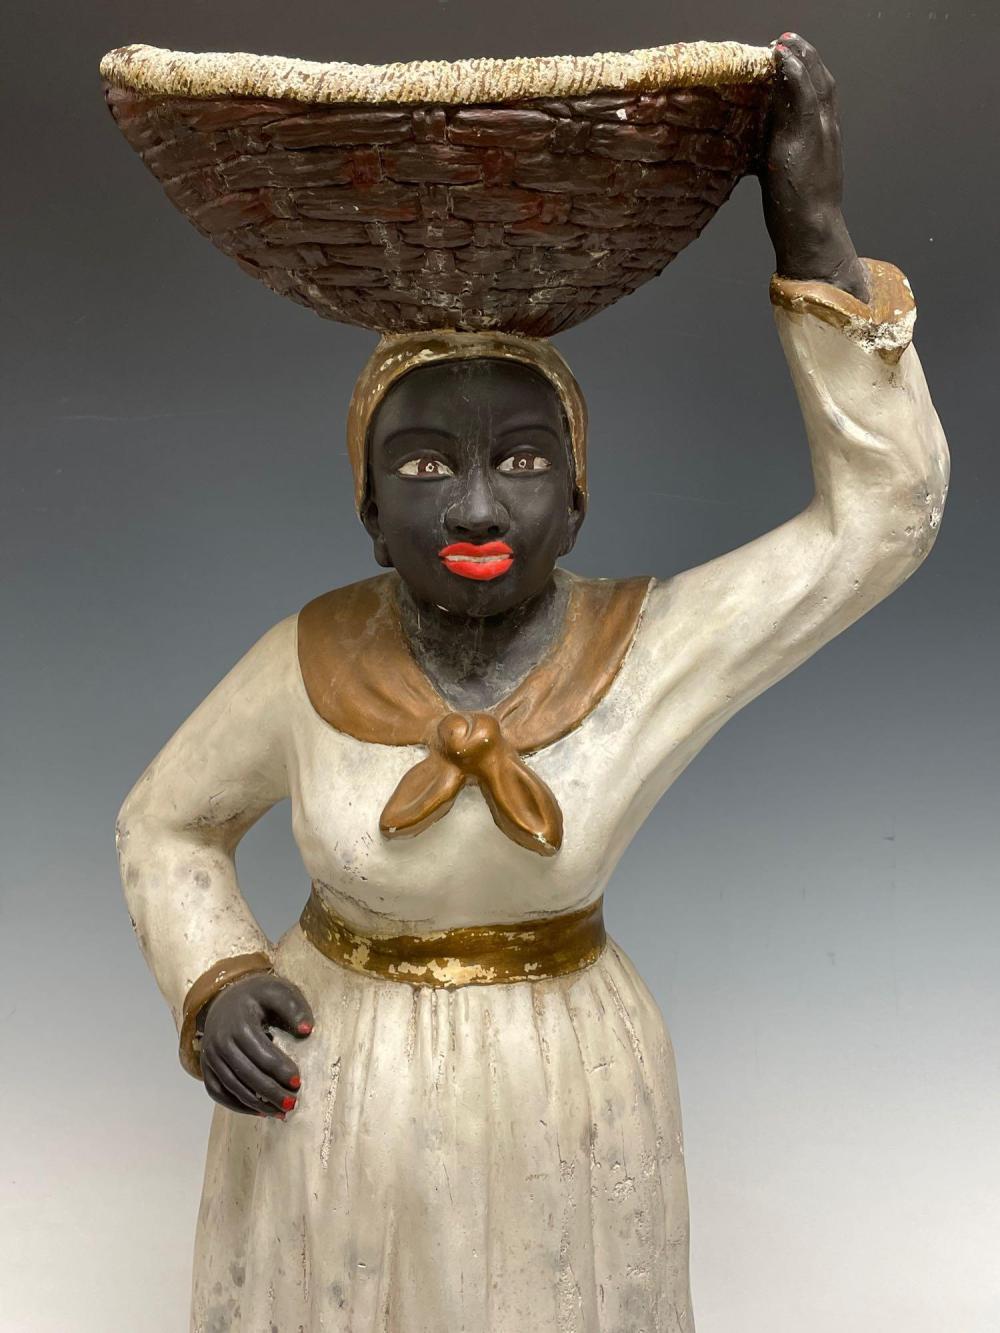 BLACK AMERICANA Woman With Basket Chalkware Folk Art Sculpture